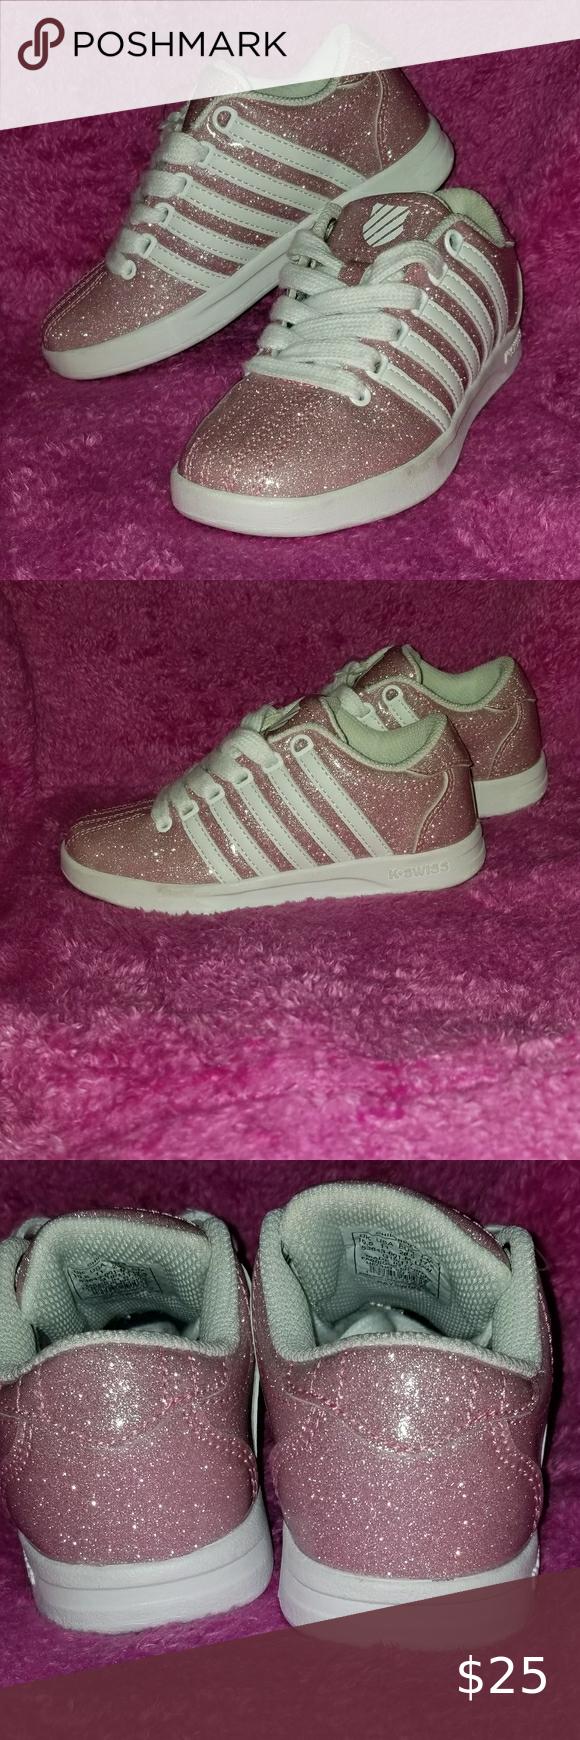 Light Pink Girls K-Swiss Bow Sneakers